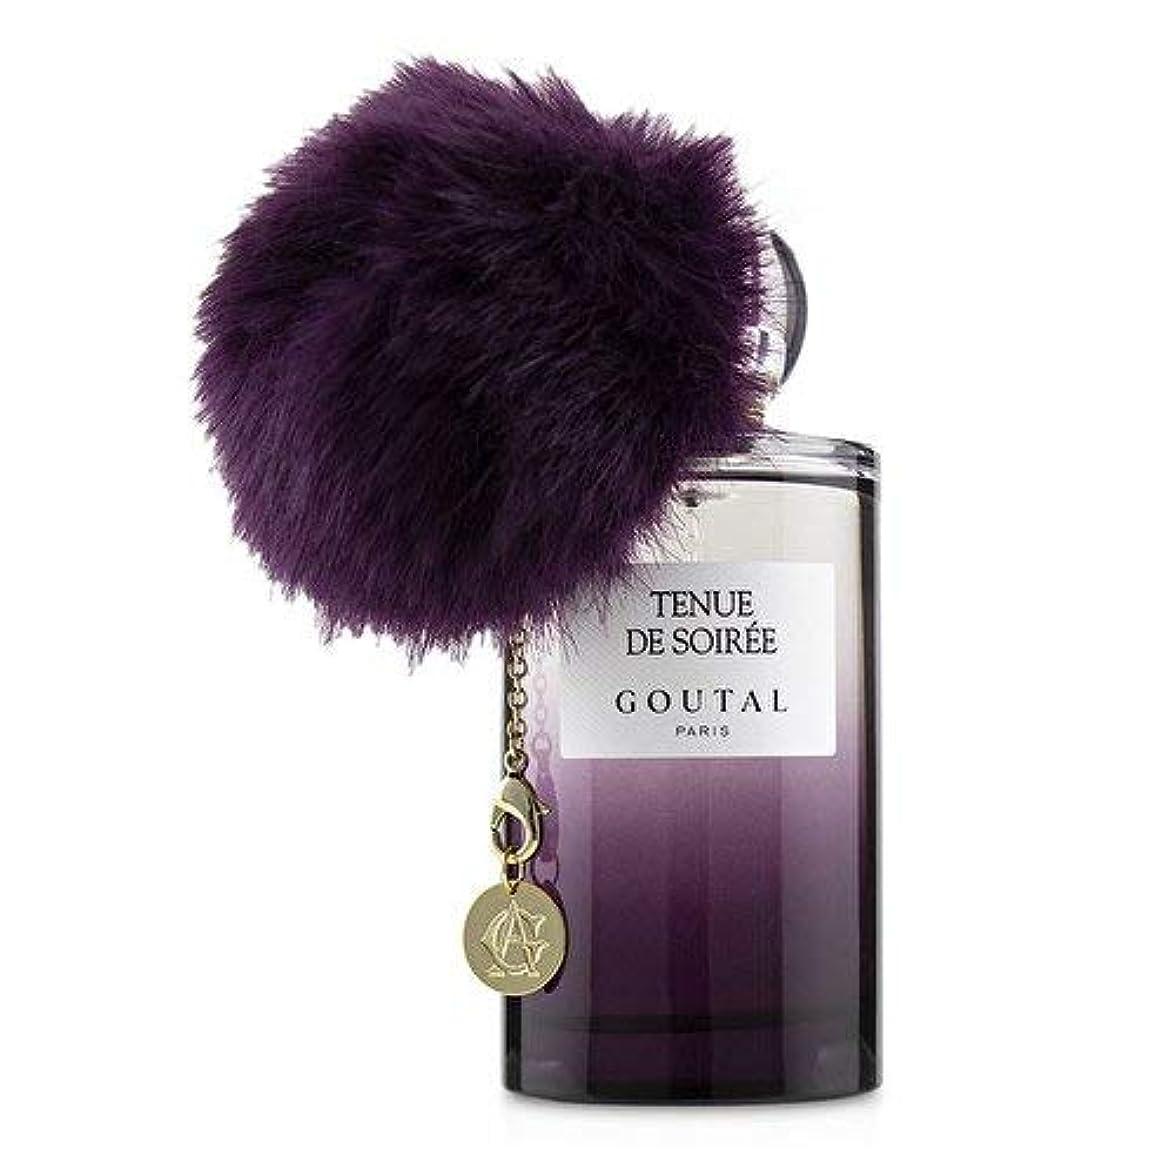 申請者小包ストレージGoutal (Annick Goutal) Tenue De Soiree Eau De Parfum Spray 100ml/3.4oz並行輸入品